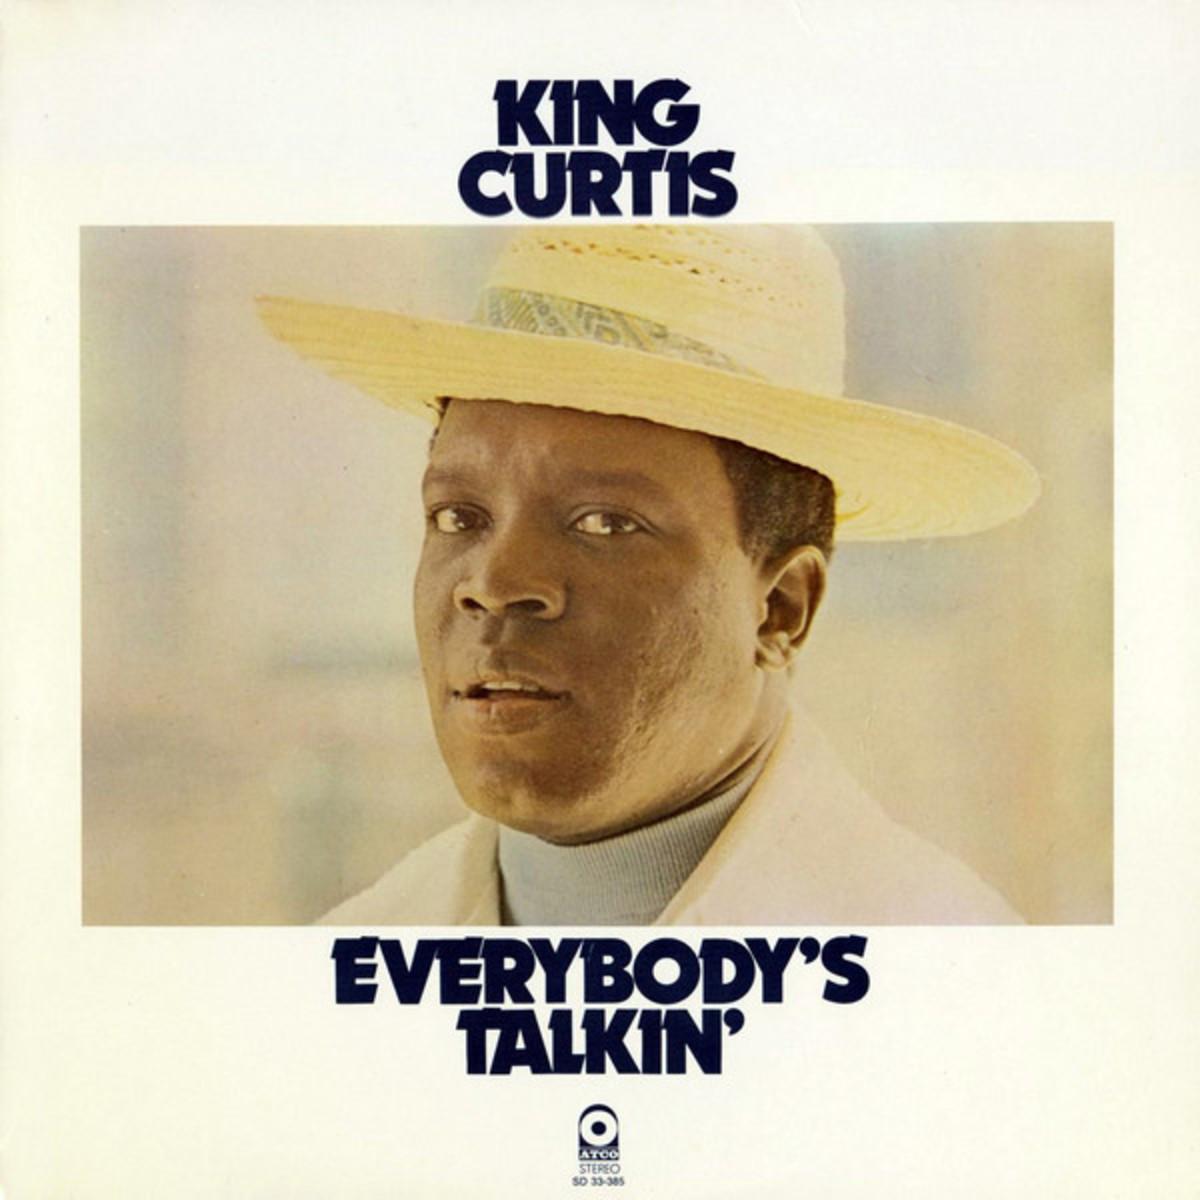 King Curtis, Everybody's Talkin